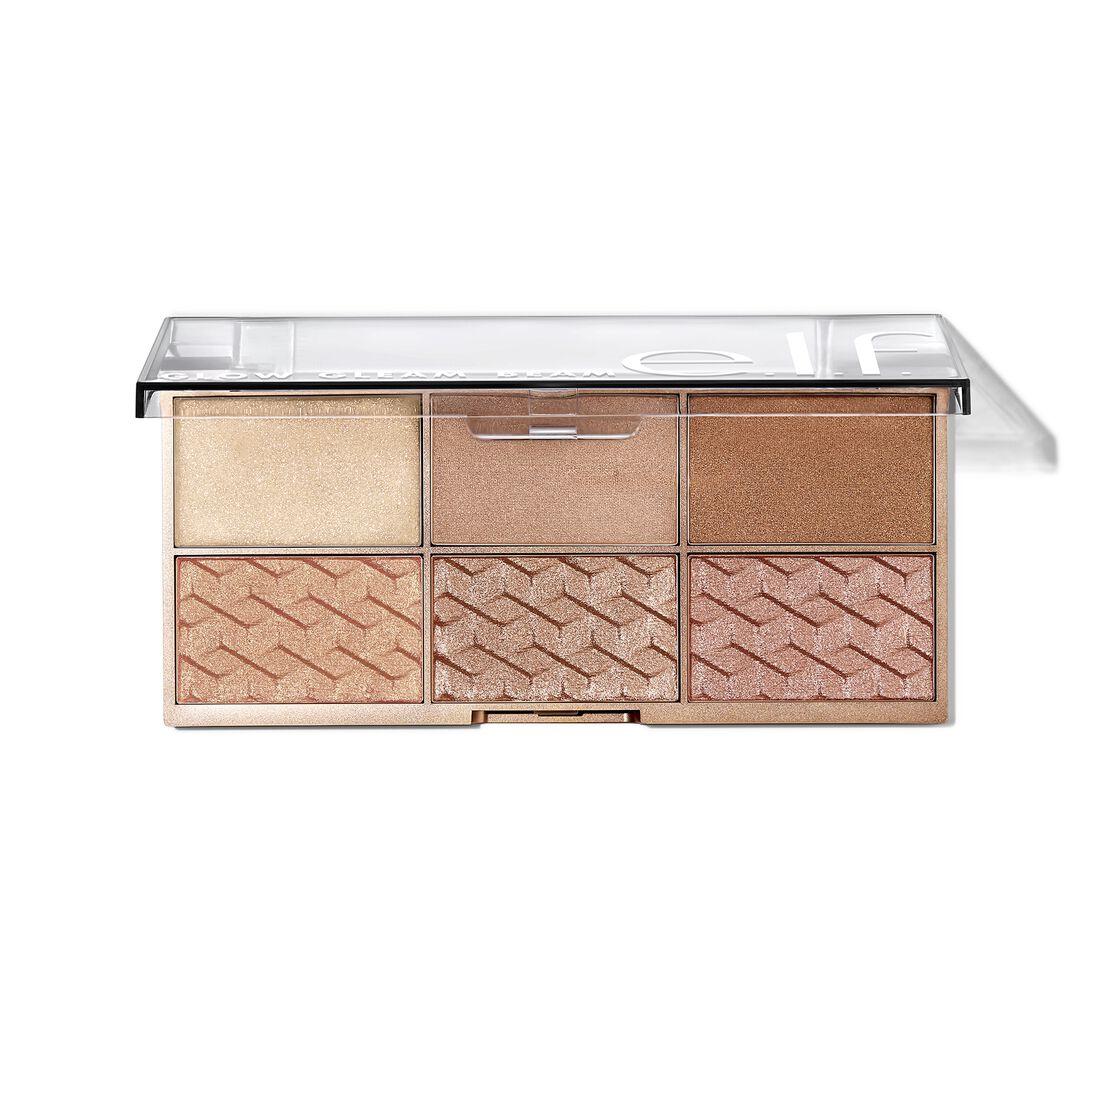 e.l.f. Cosmetics - Glow Gleam Beam Highlighter Palette